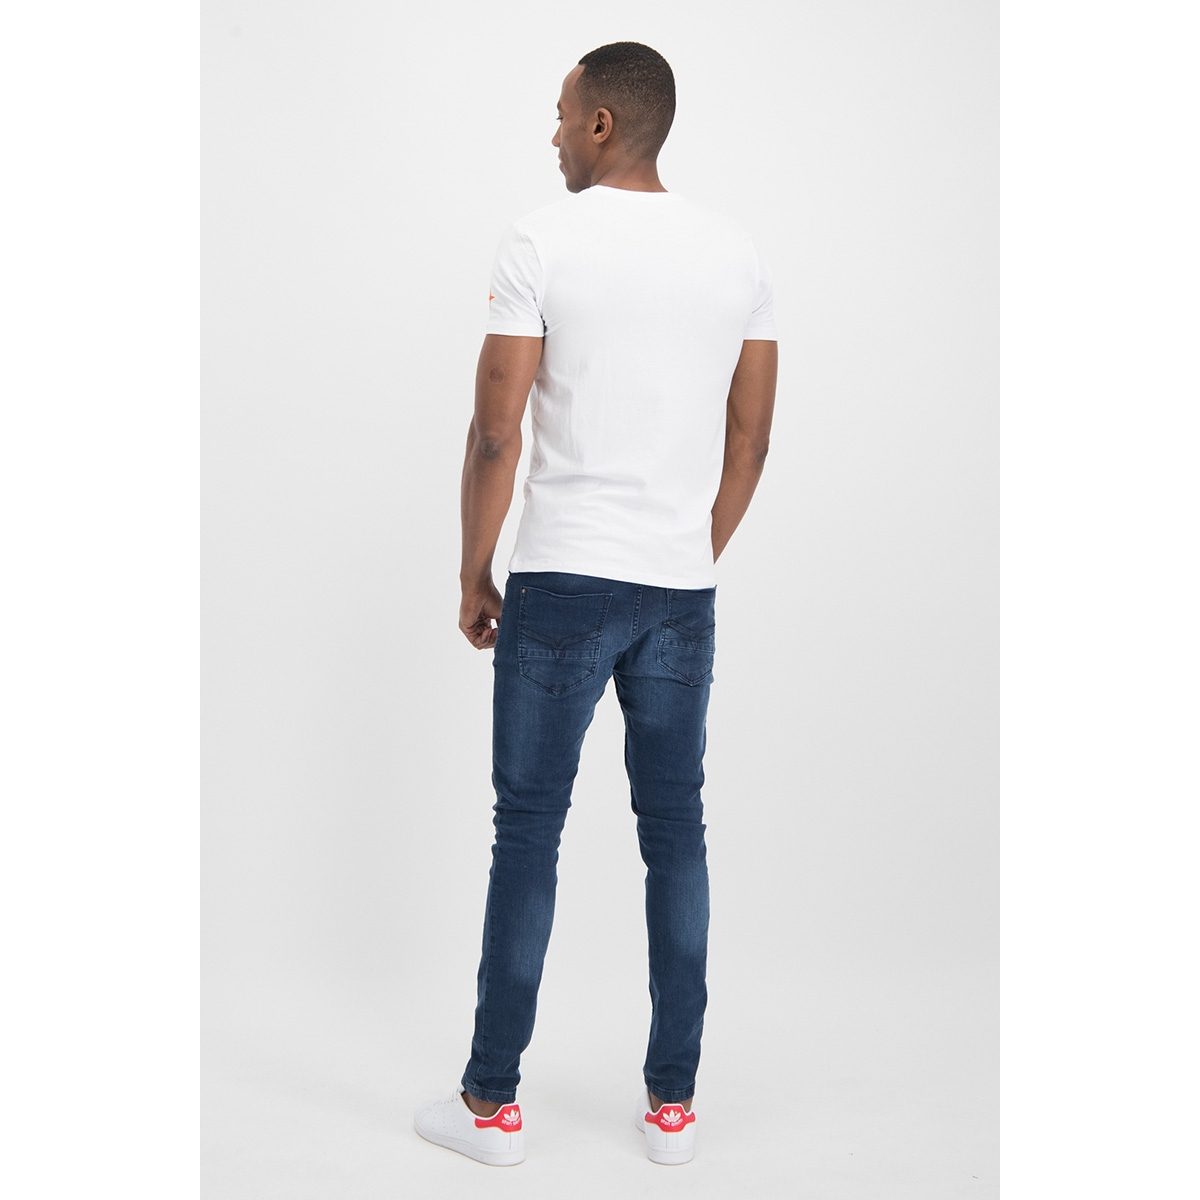 tee o me 0002 haze & finn t-shirt white